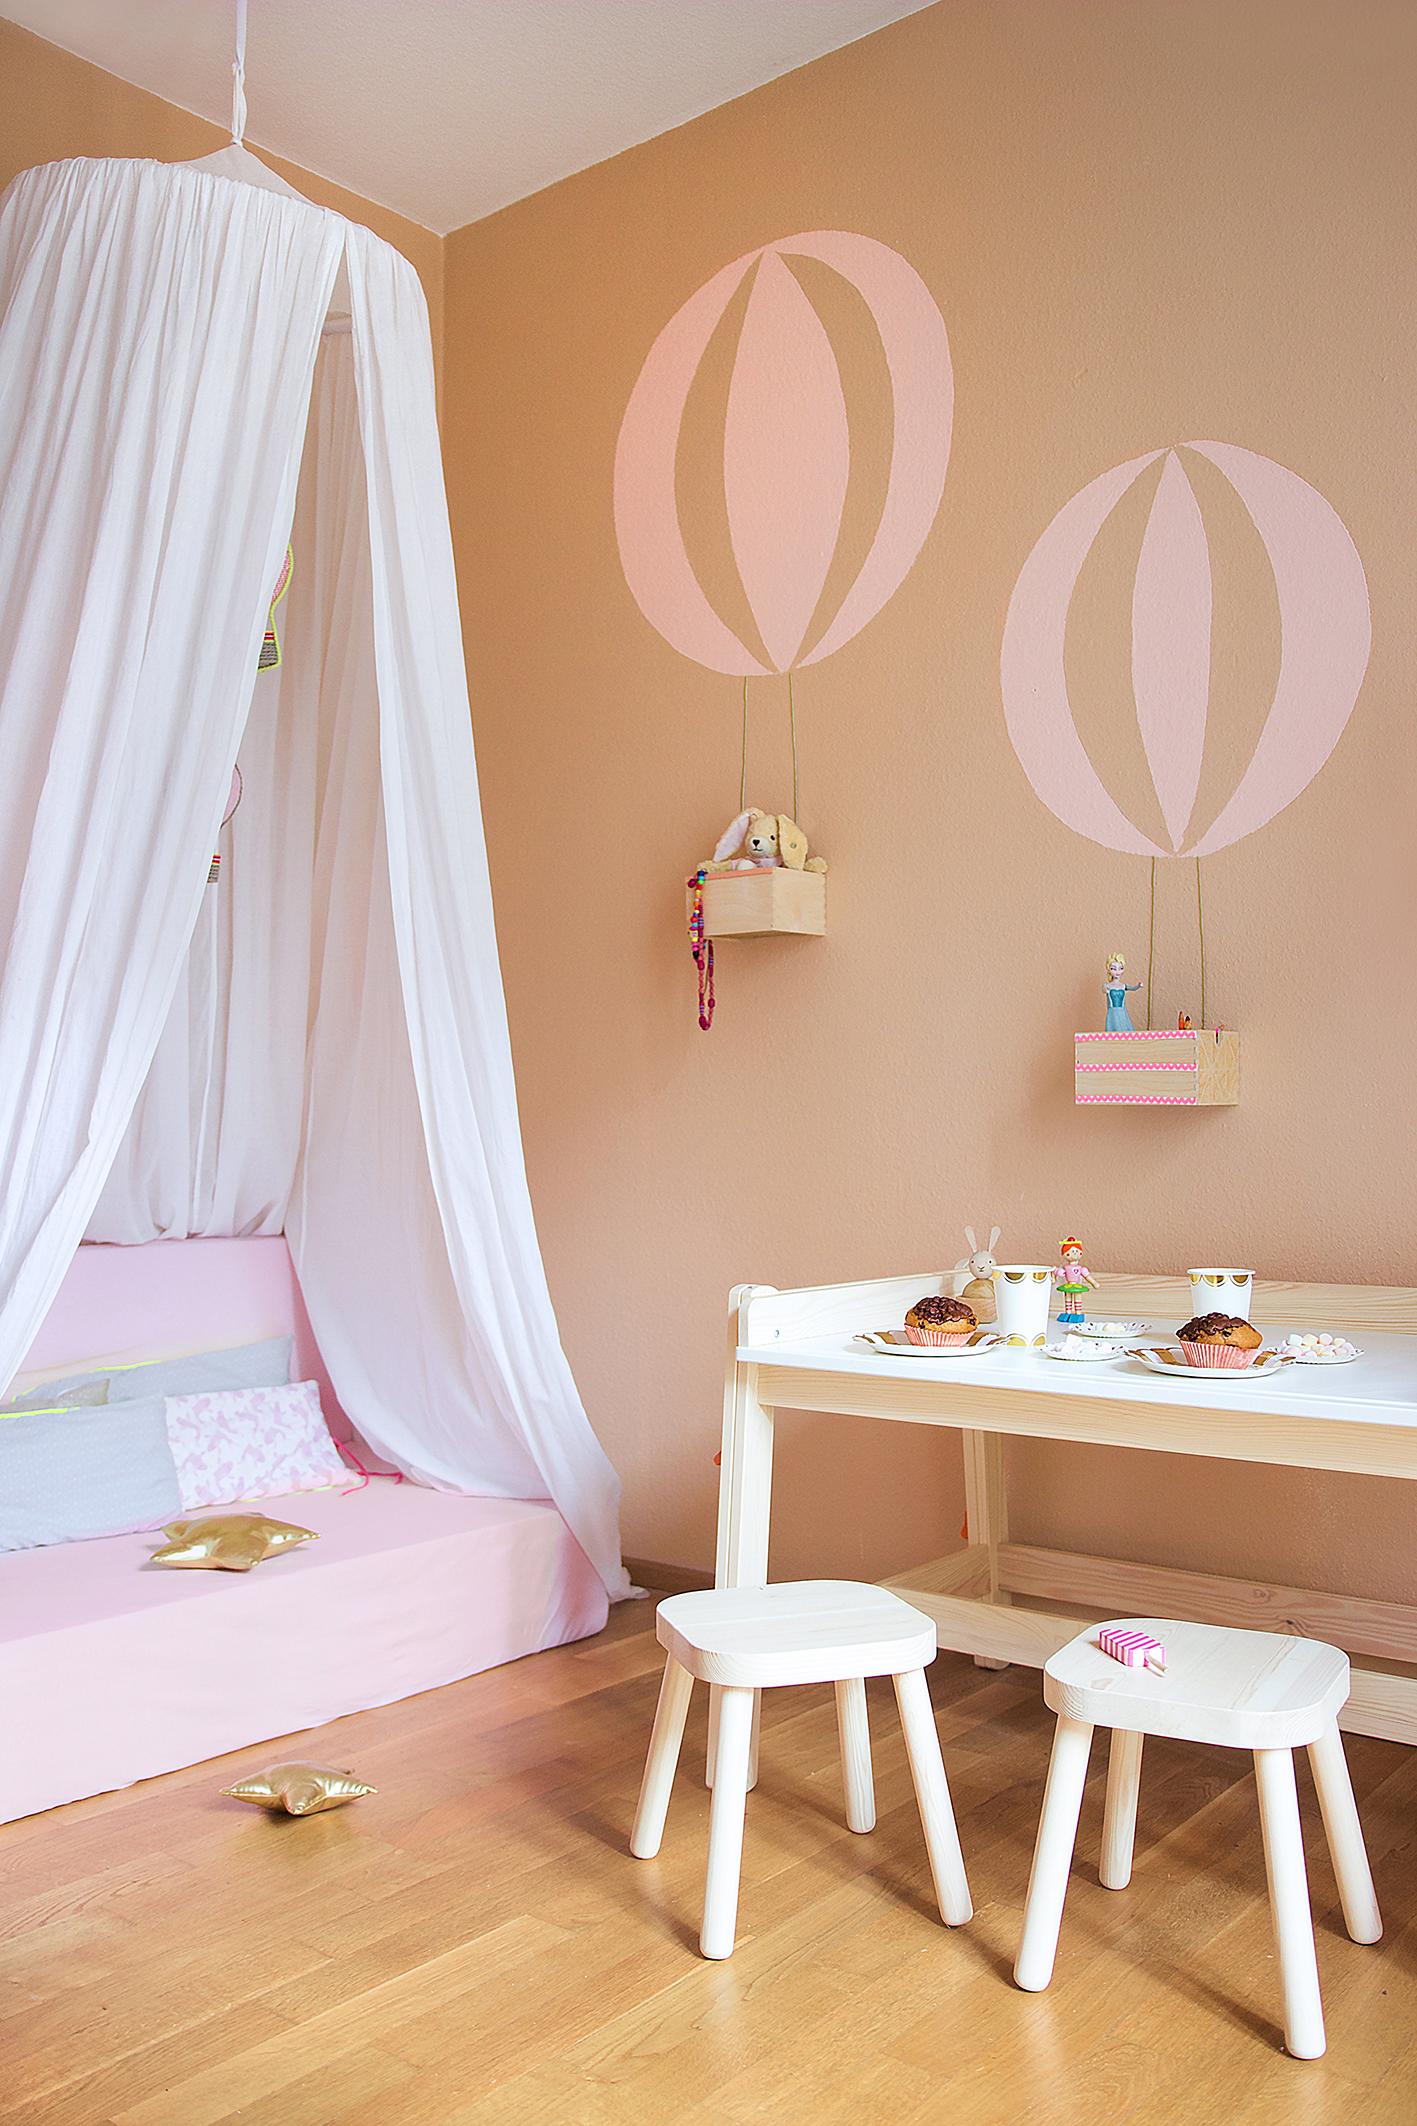 DIY Wand mit Ballon-Motiv • www.sammydemmy.de